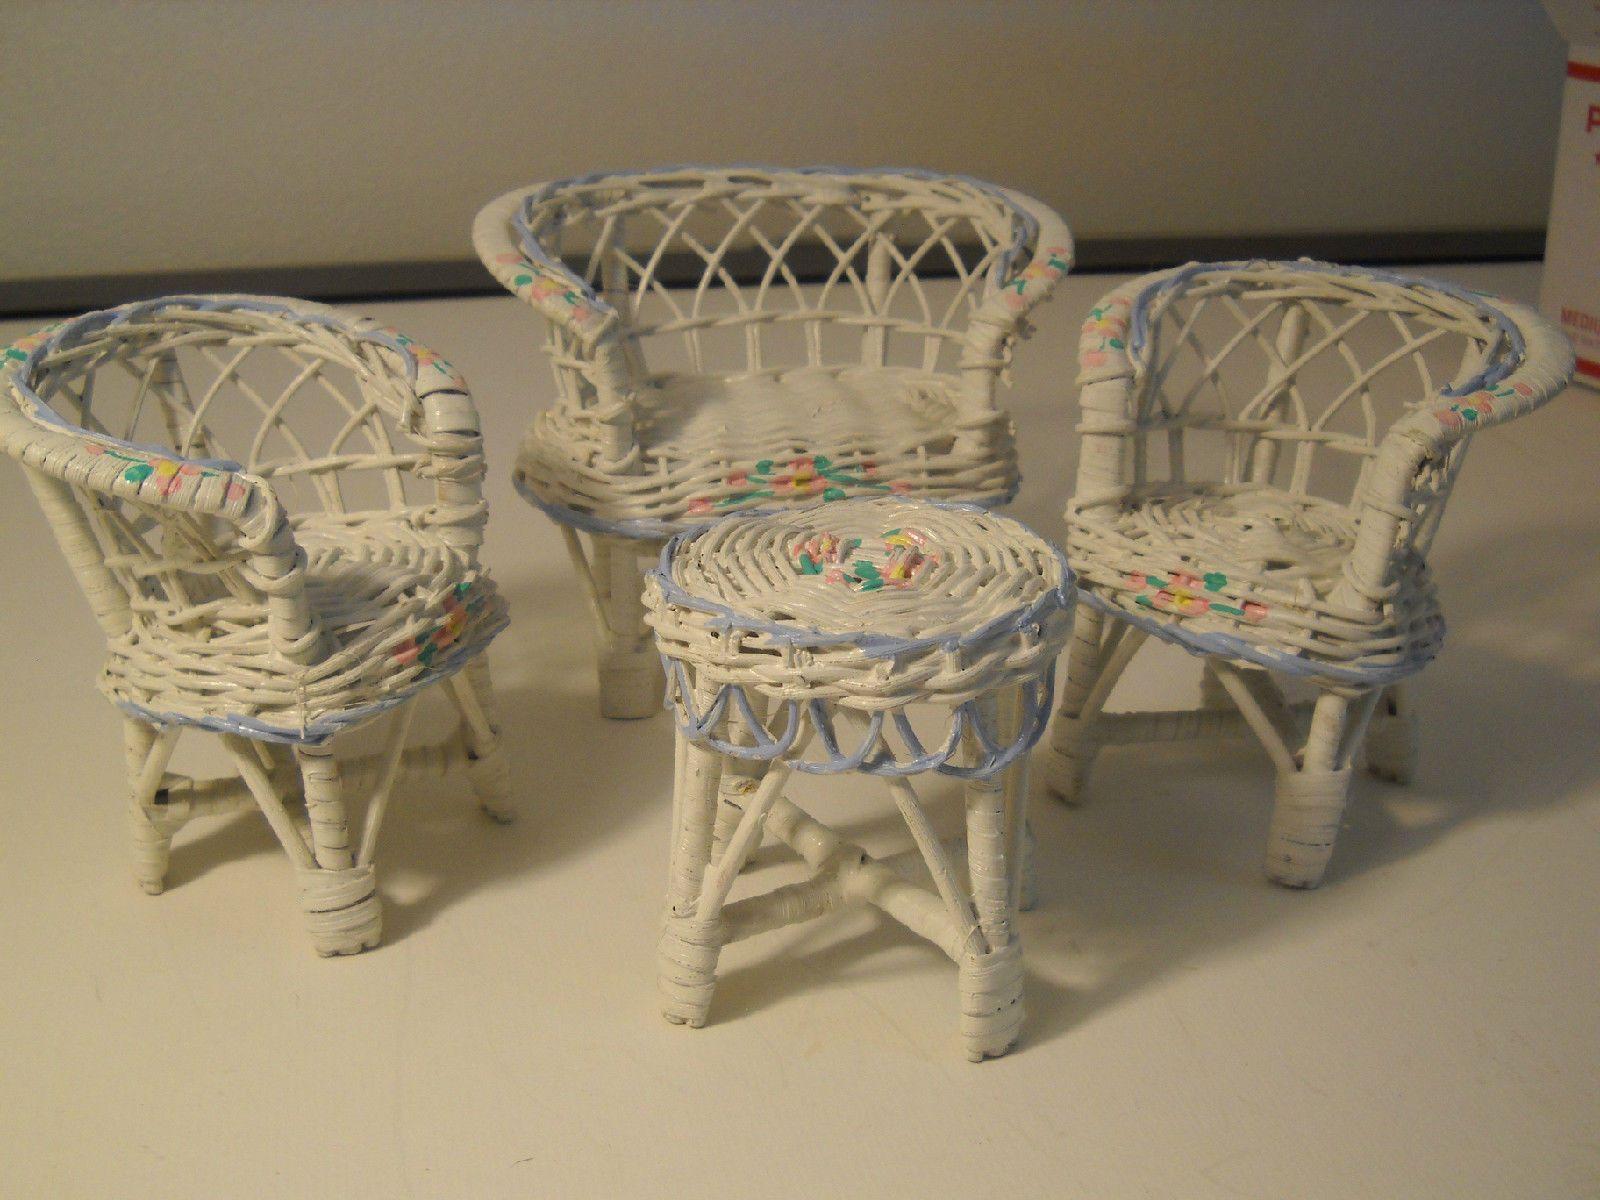 Re painted Vintage Barbie 4 Piece White Wicker Patio Furniture Set